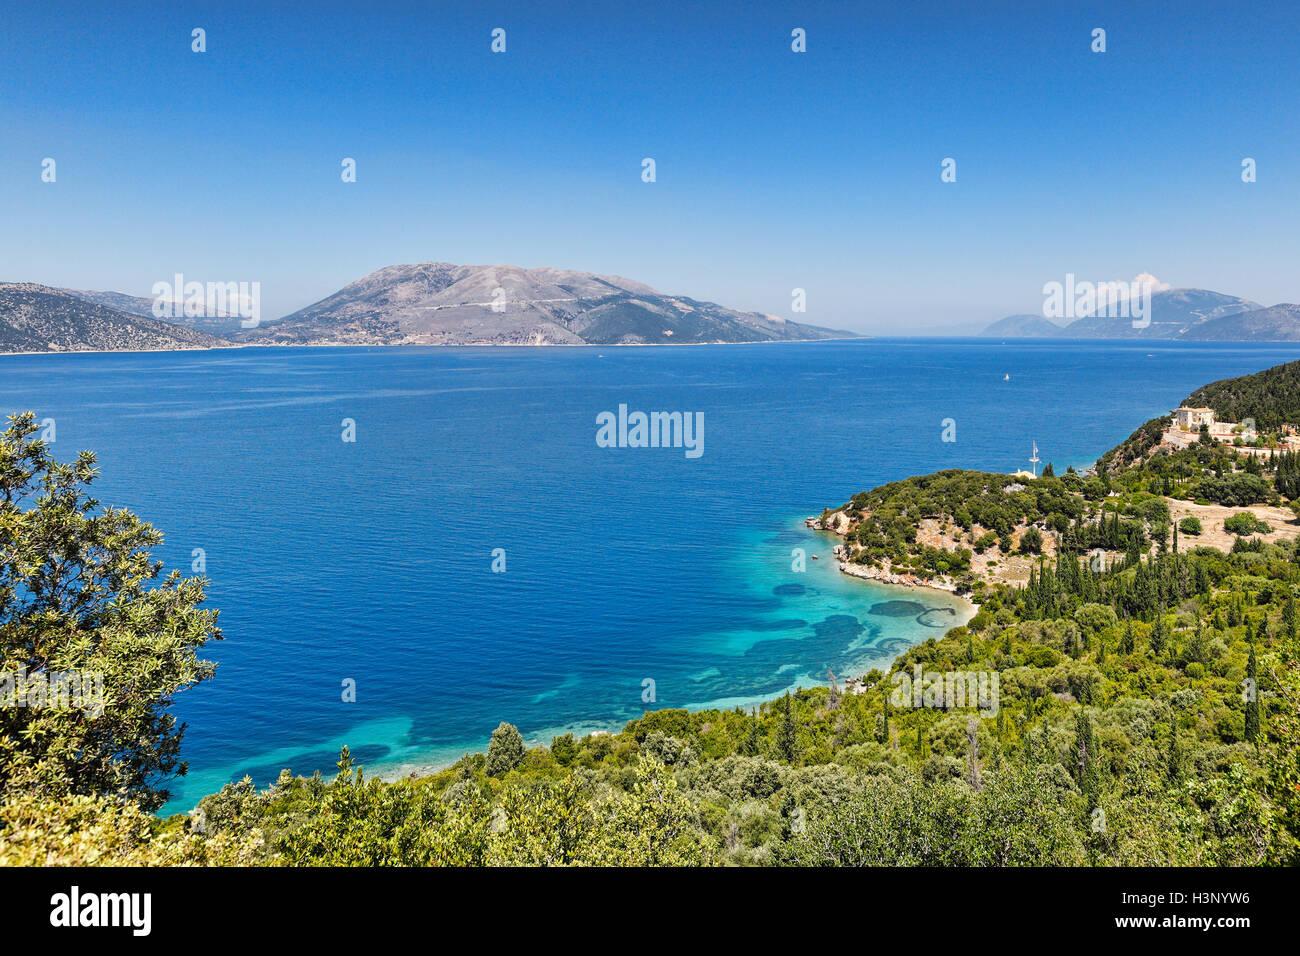 The beach Dichala in Kefalonia island, Greece - Stock Image